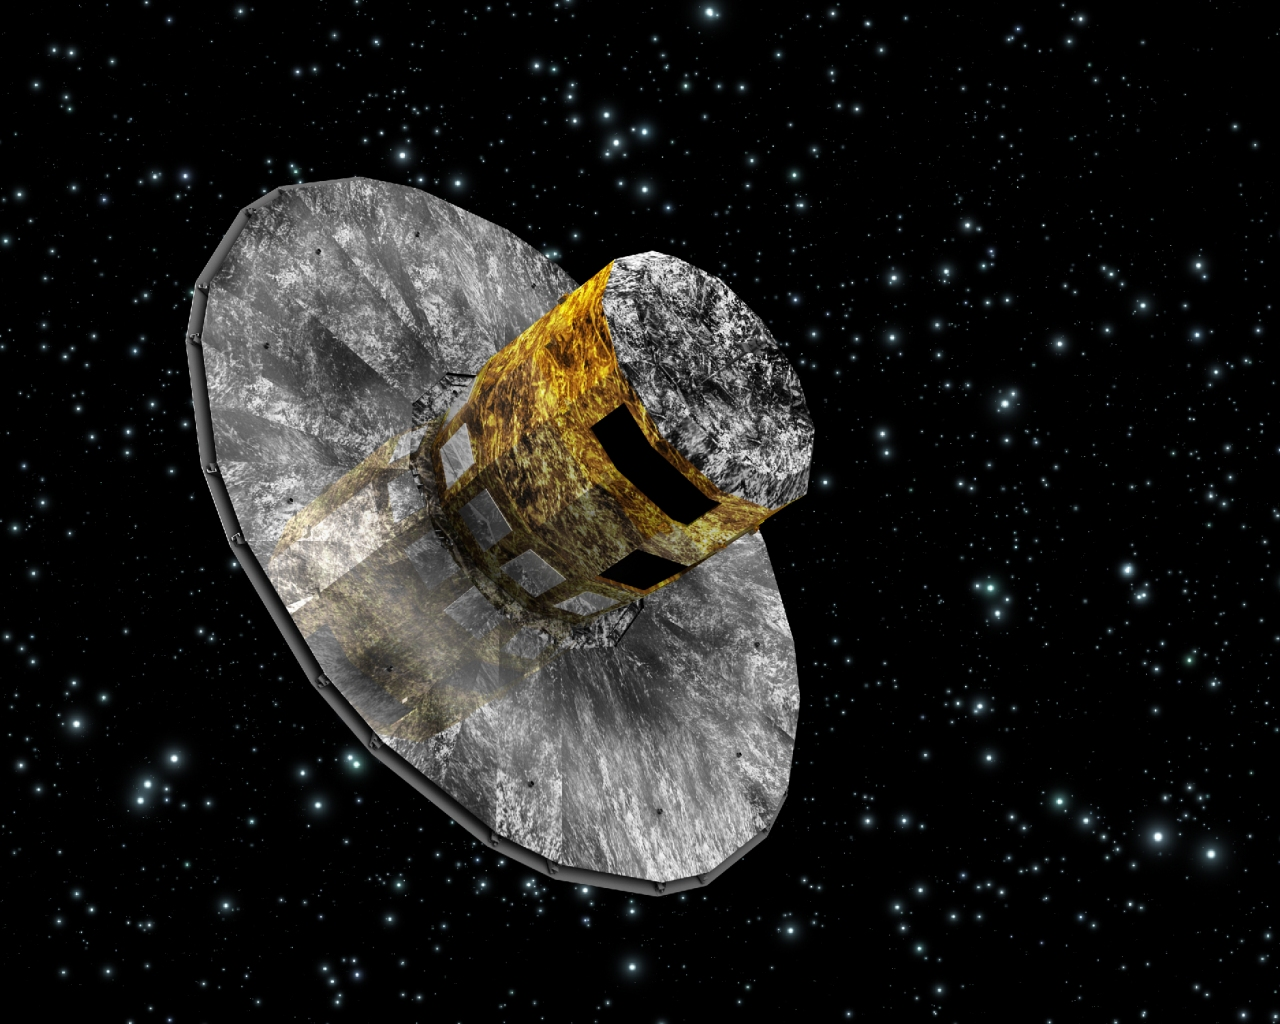 1567218796766-Gaia_Spacecraft-wallpaper.jpg